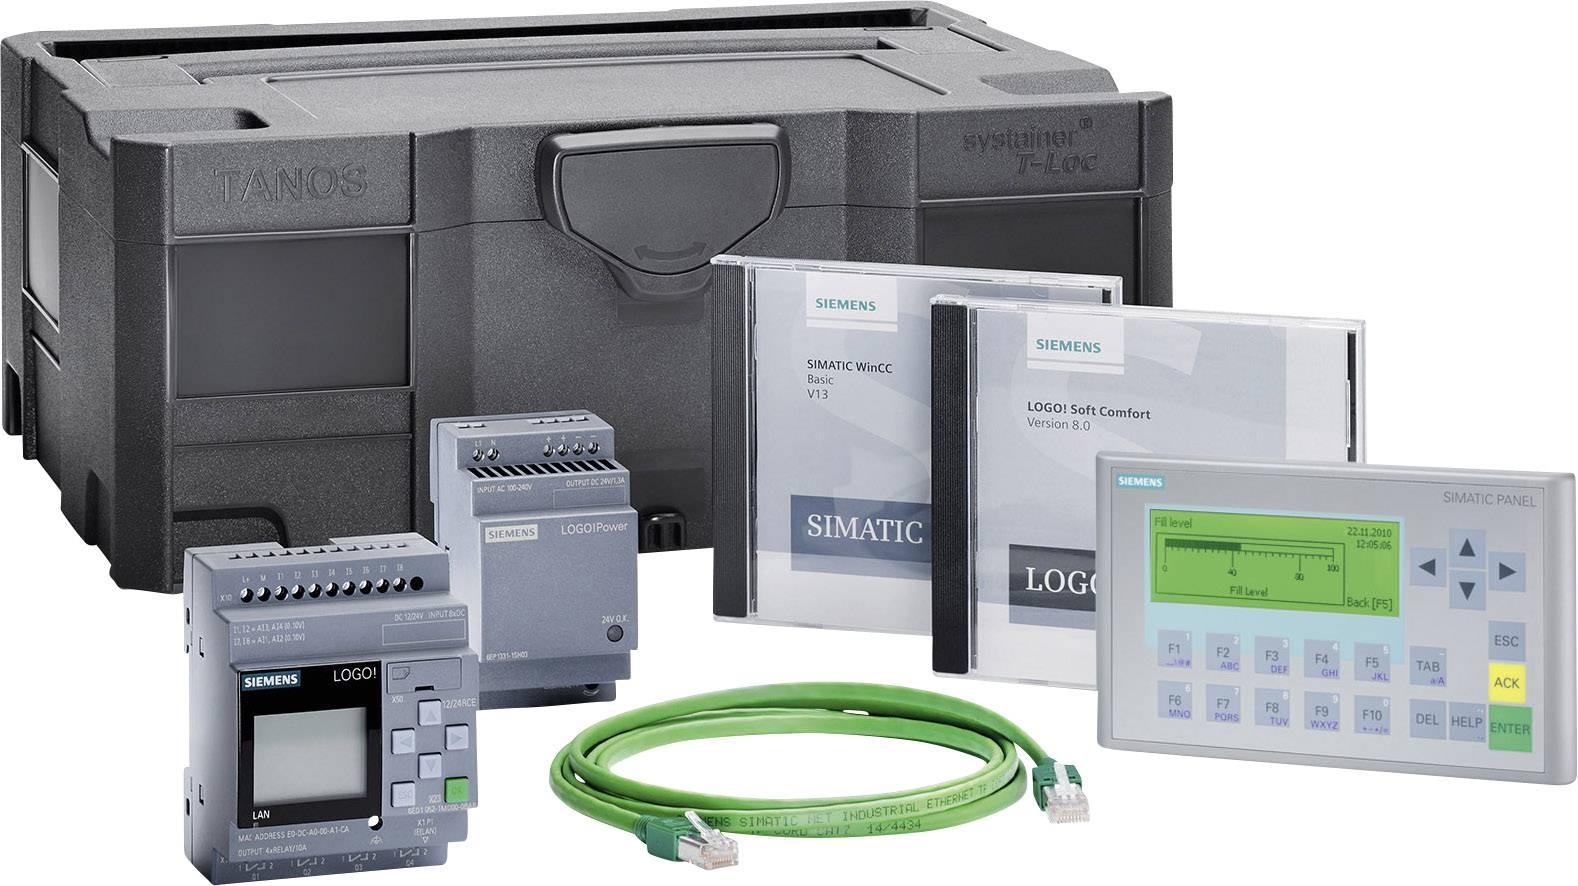 Startovací sada pro PLC Siemens LOGO! KP300 BASIC STARTER LOGO! 12/24RCE 6AV2132-0HA00-0AA1